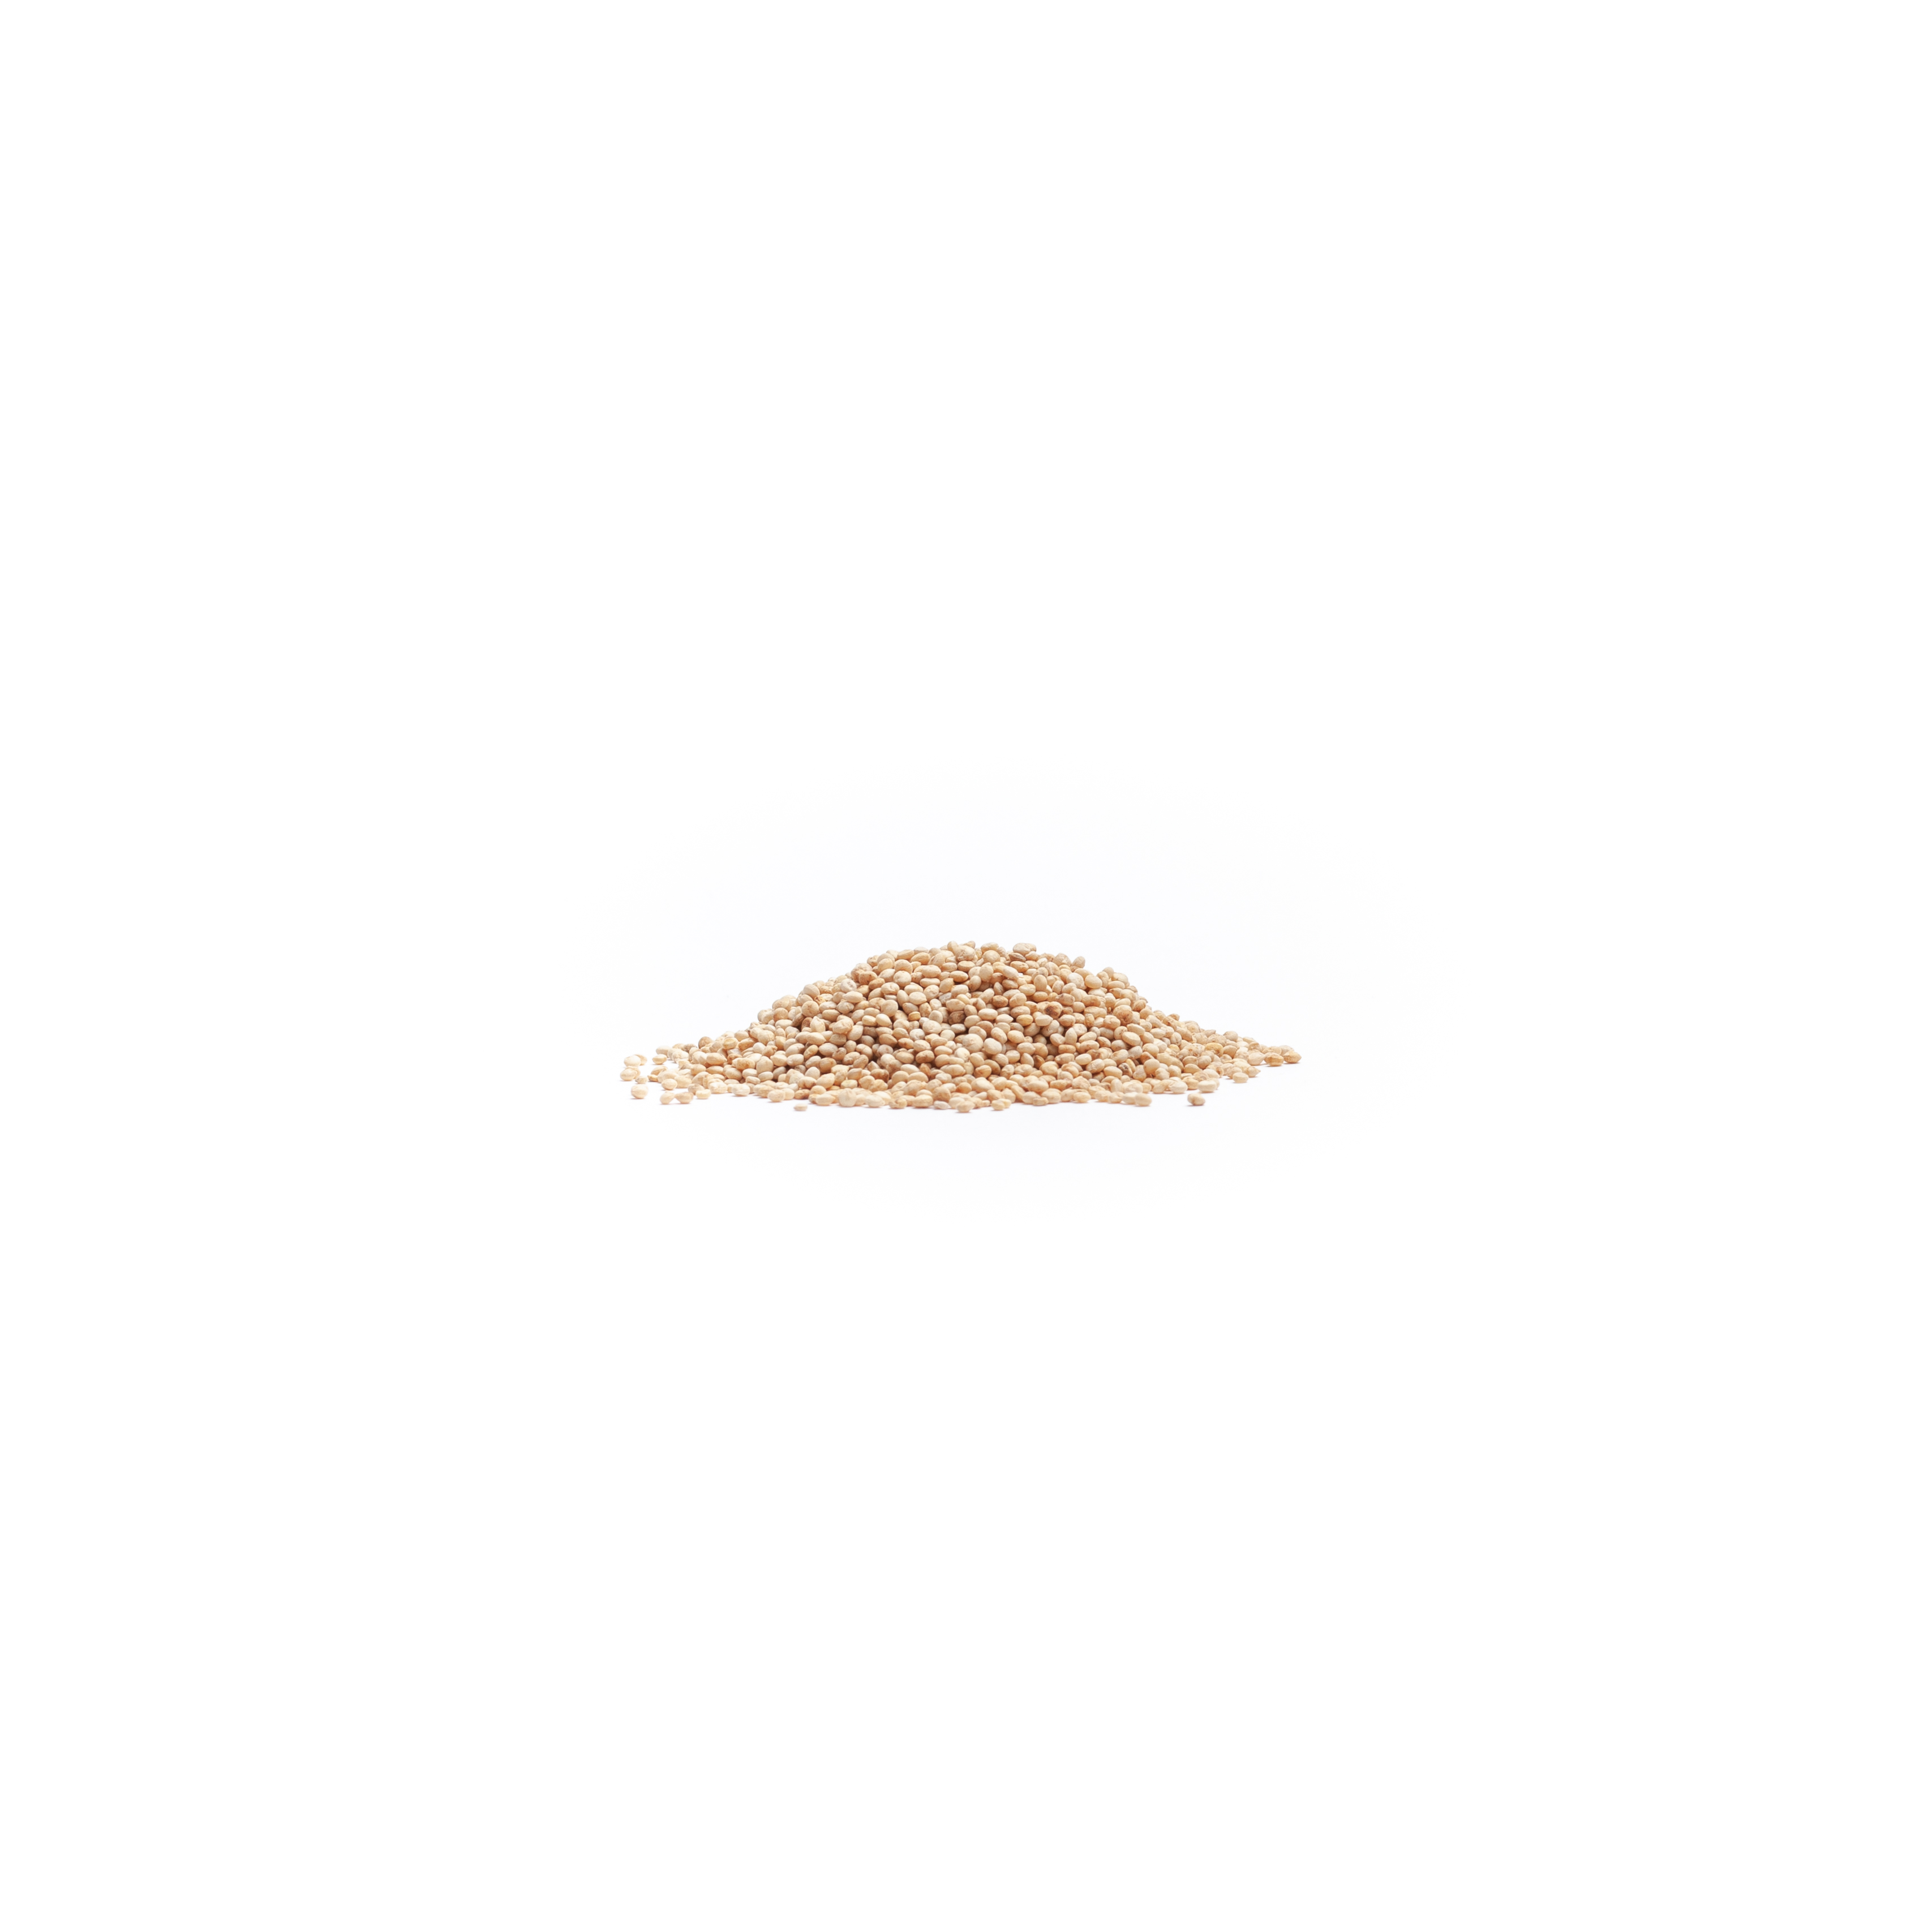 Quinoa: Wholegrain | Hodmedod's